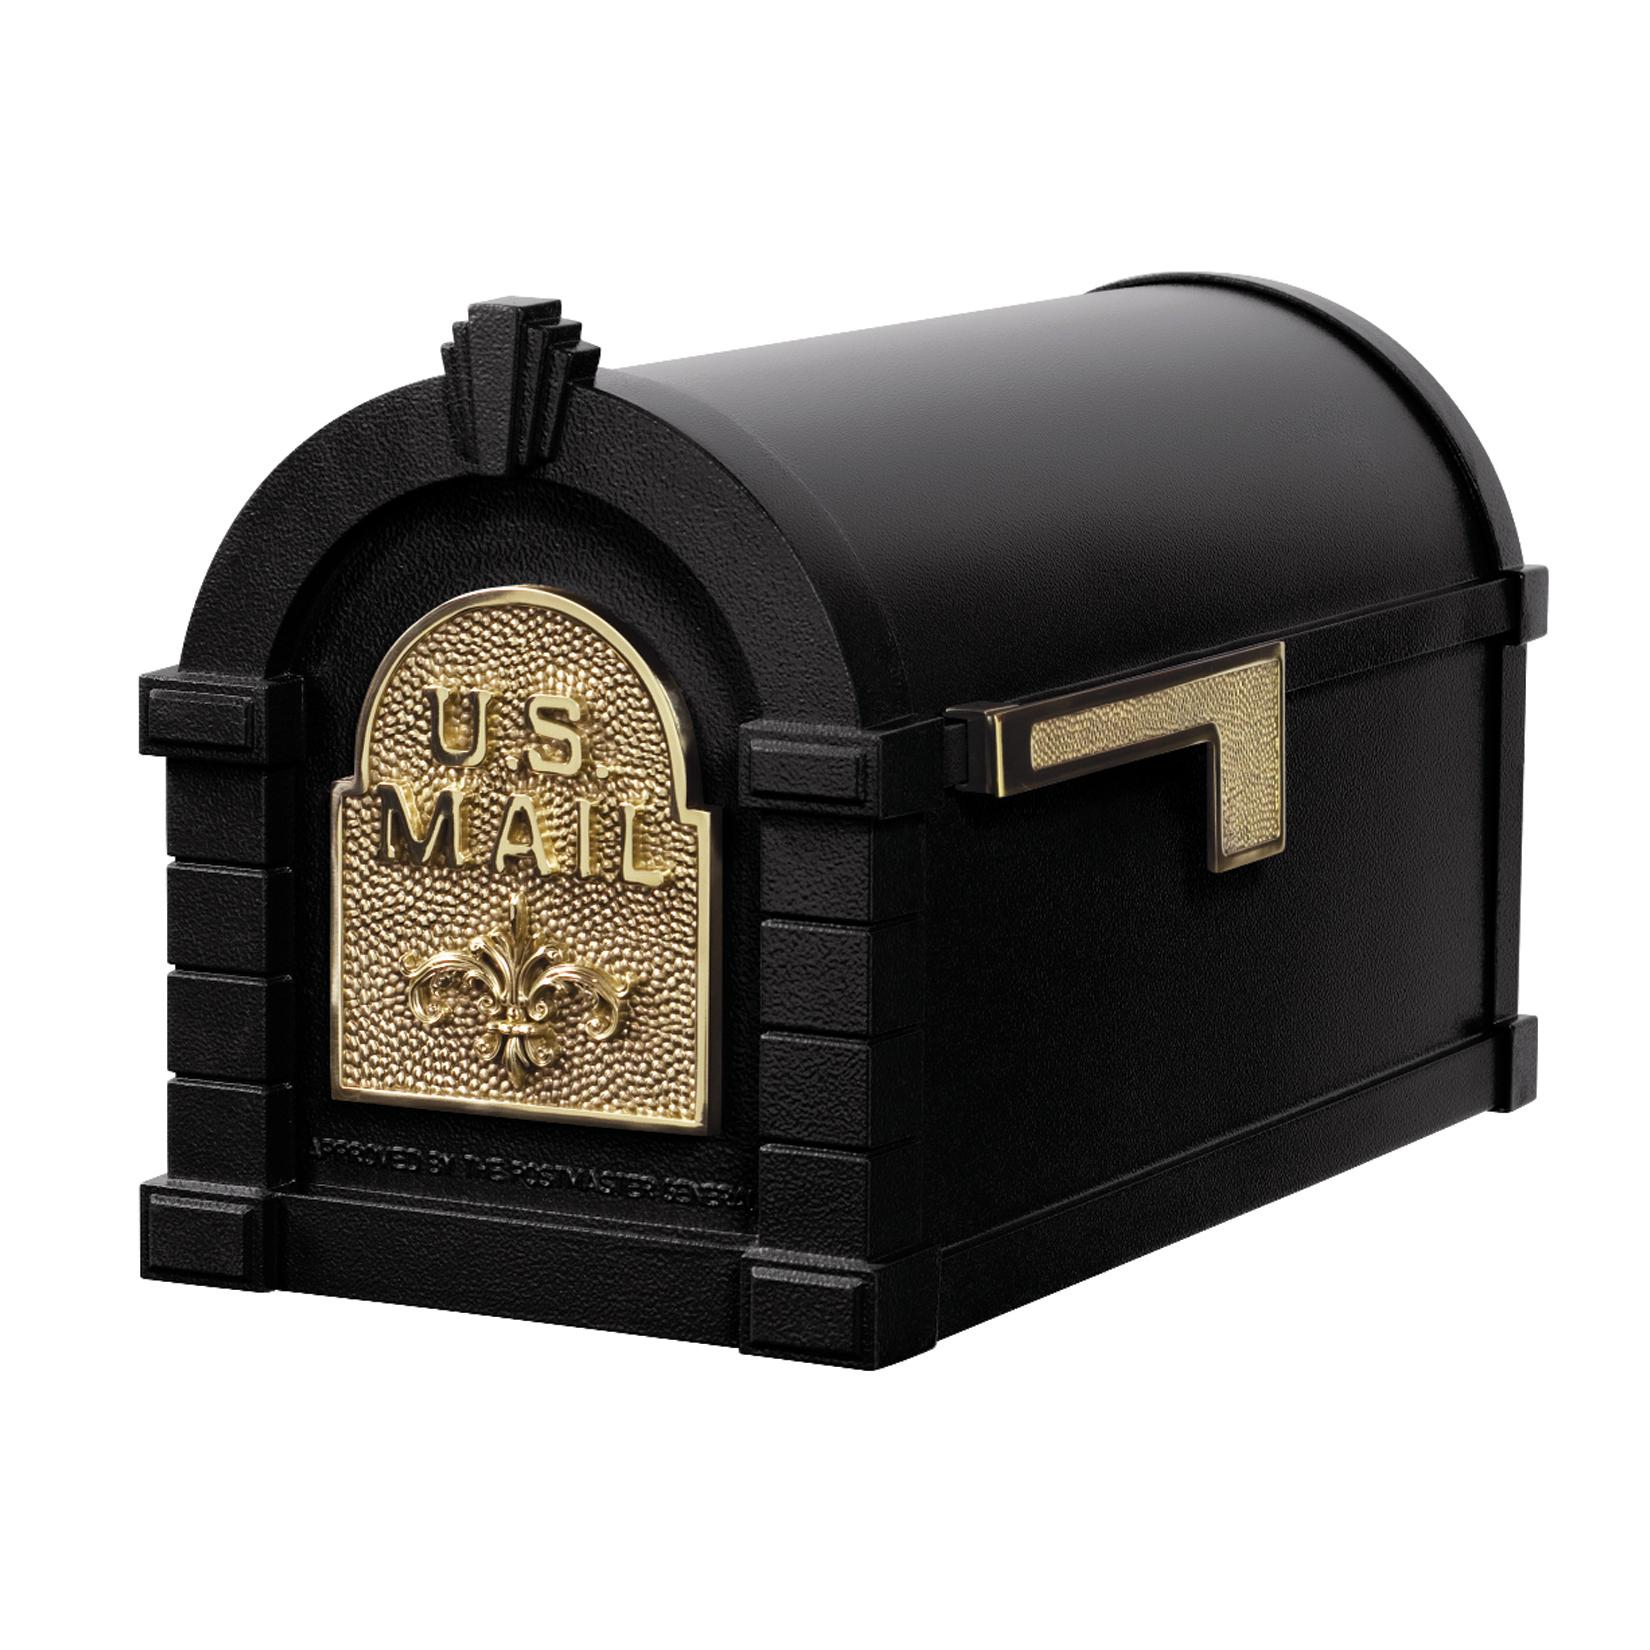 Gaines Fleur De Lis Keystone Mailboxes - Black with Polished Brass